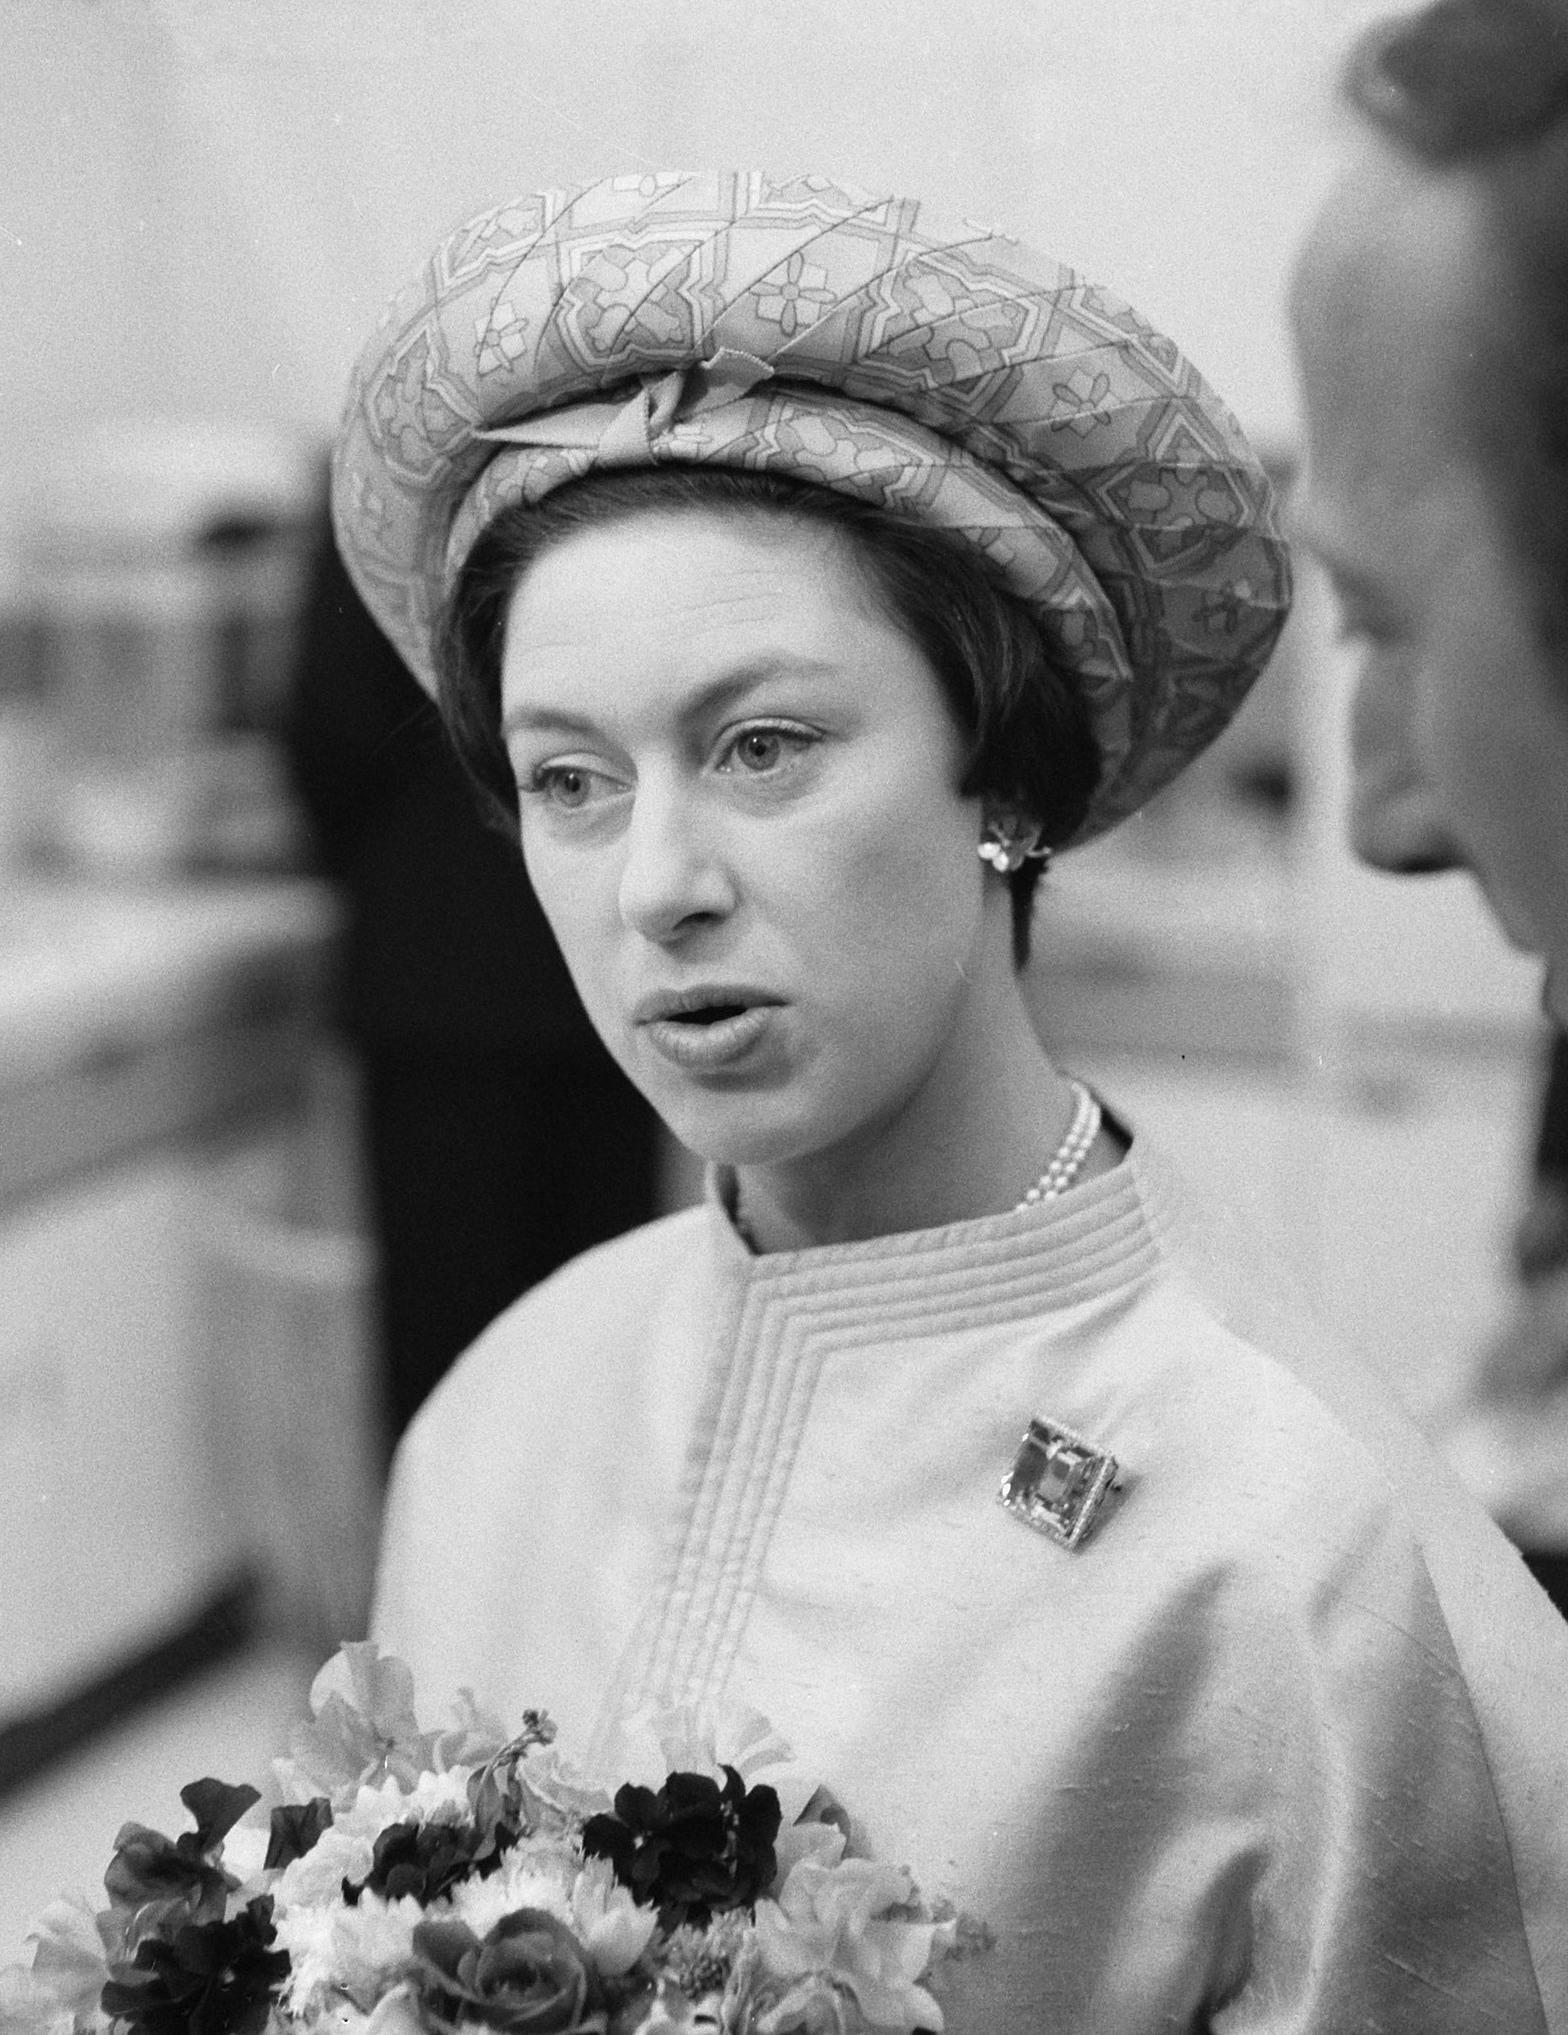 Margaret England